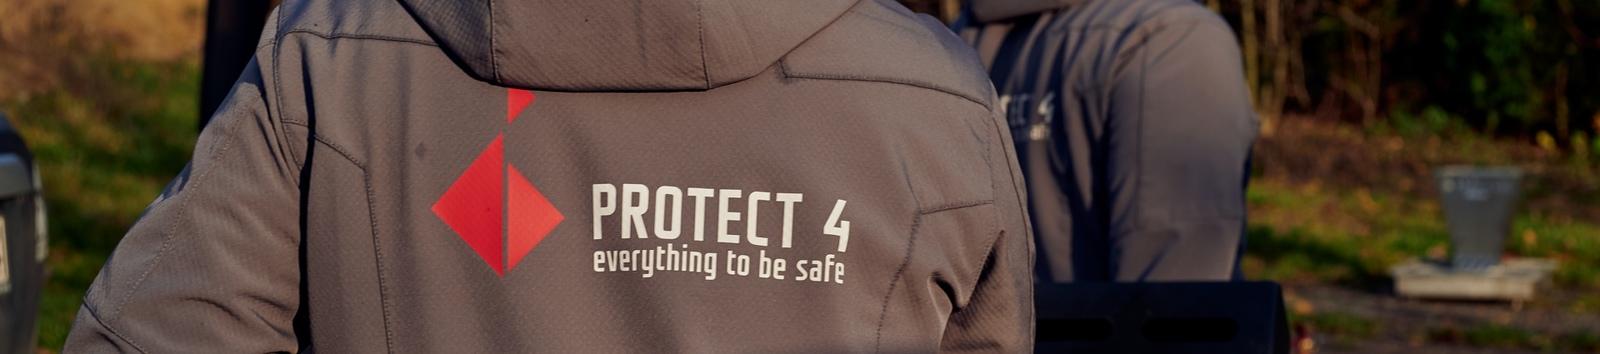 Kurtka Protect 4